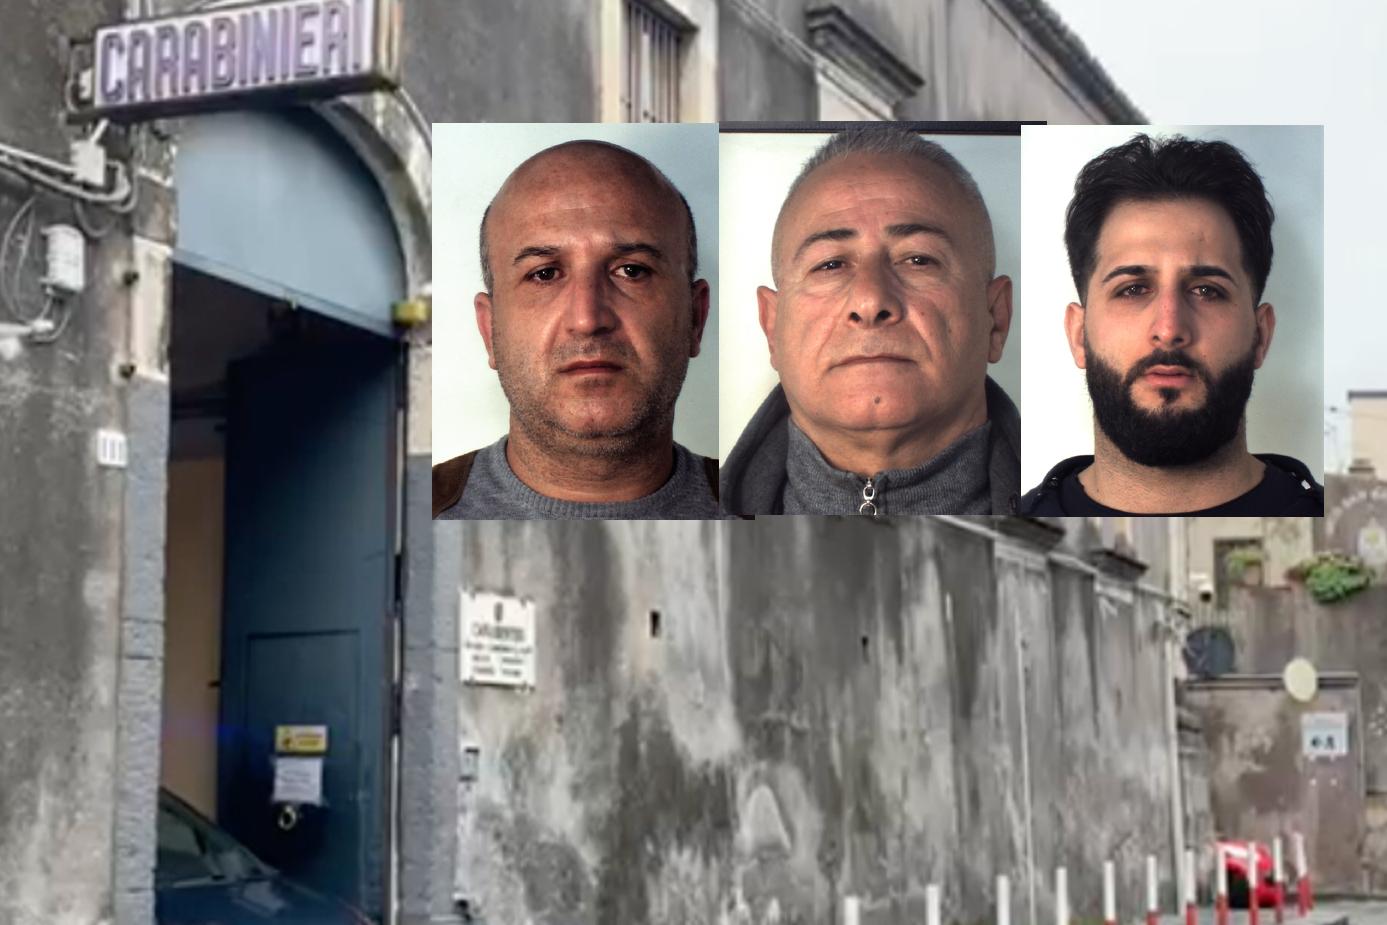 Lite tra famiglie per una crisi di coppia: tre arresti a Catania (VIDEO)